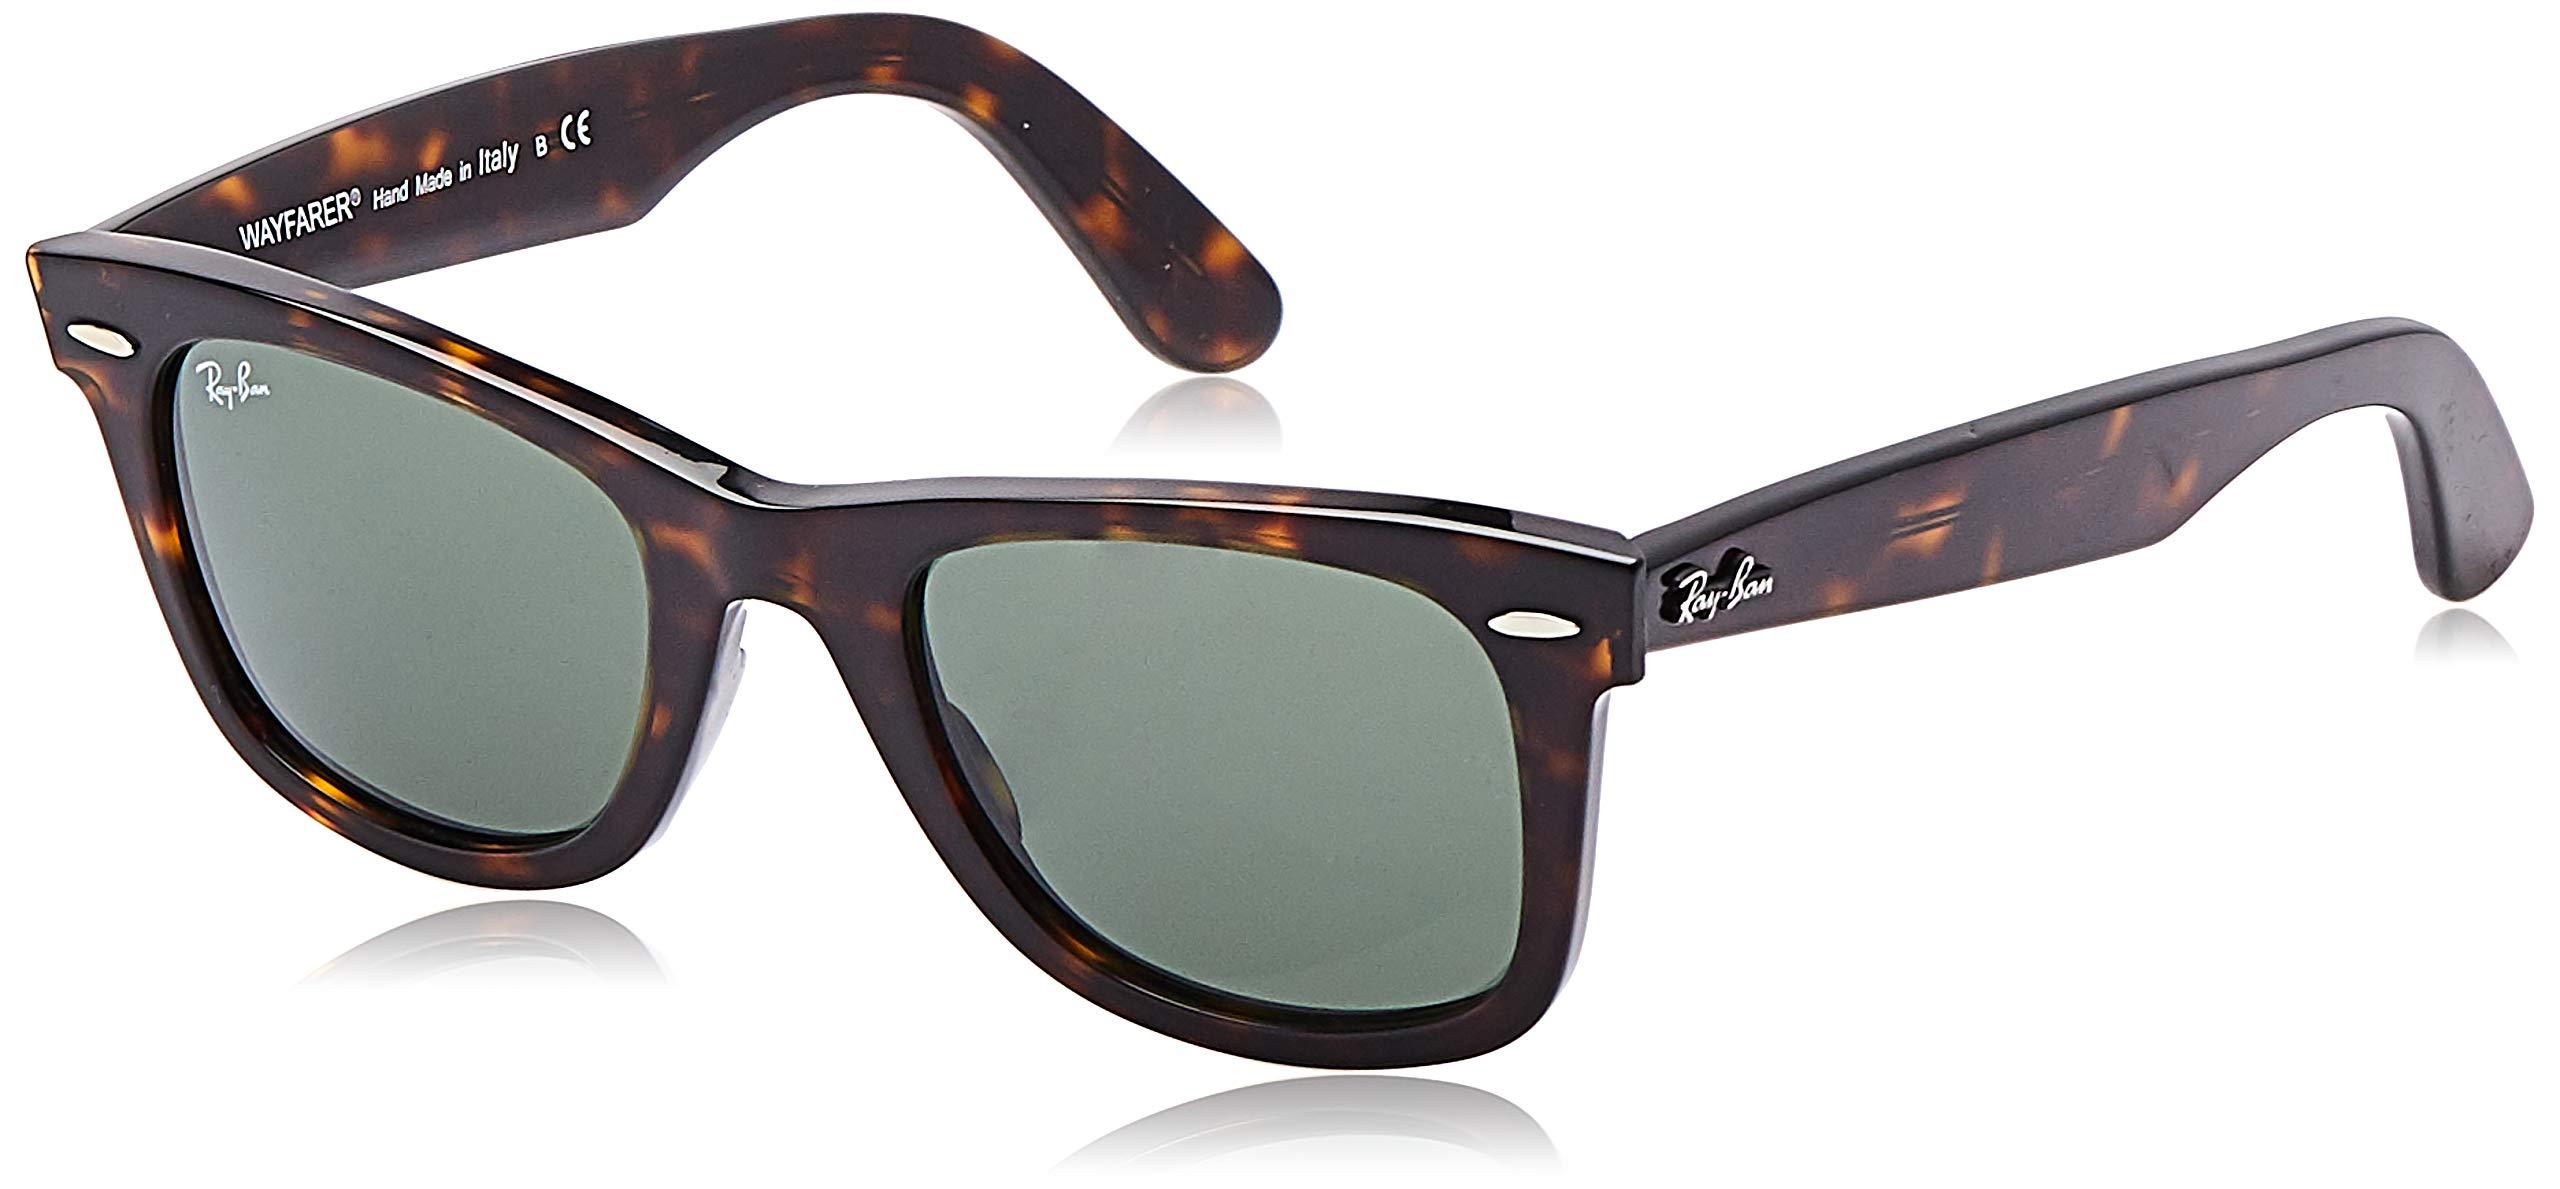 Ray-Ban RB2140 Wayfarer Sunglasses, Tortoise/Green, 50 mm by RAY-BAN